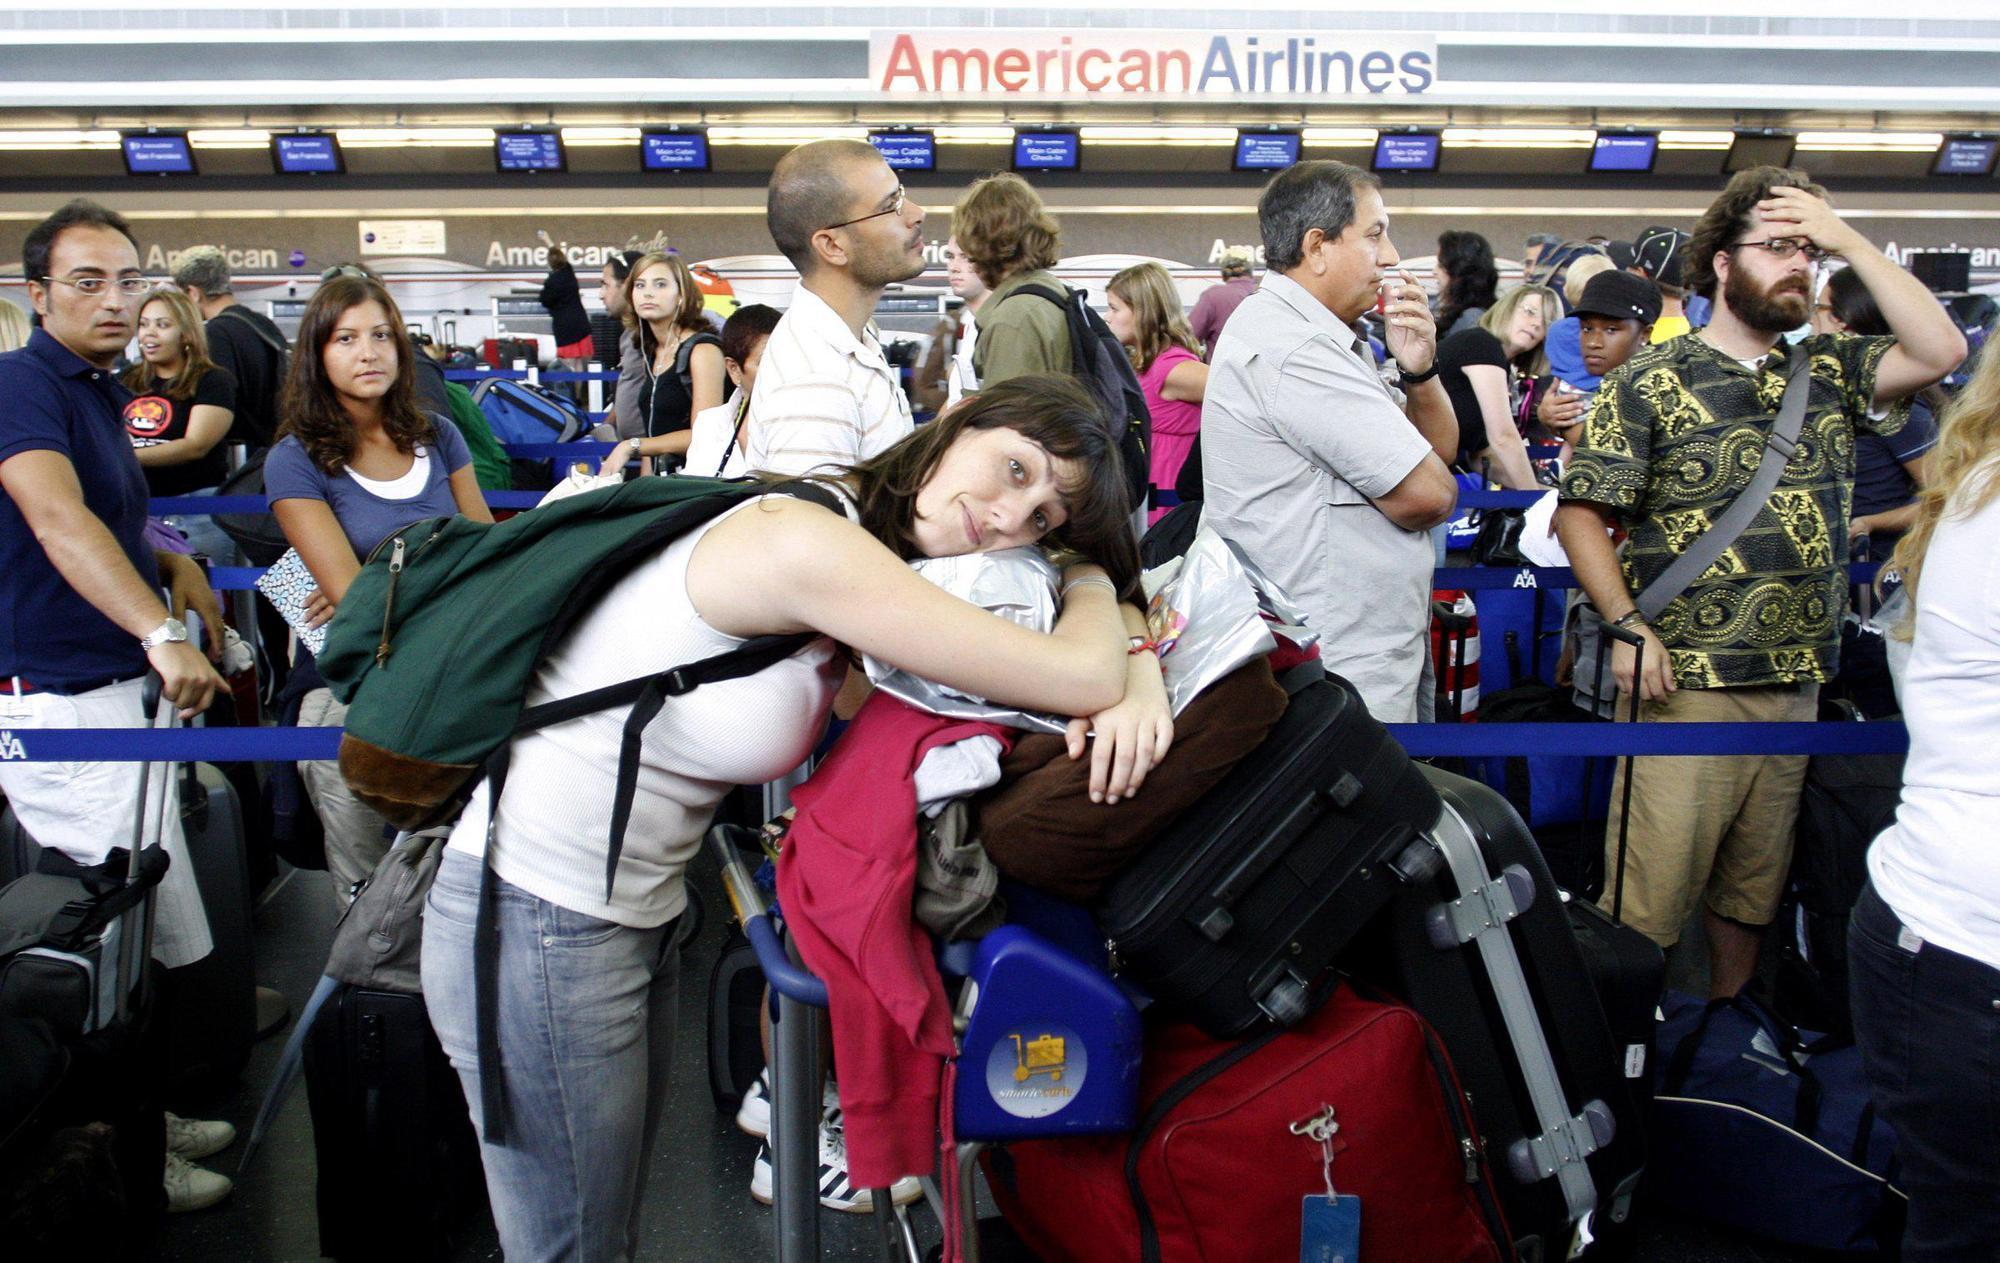 laggage airport